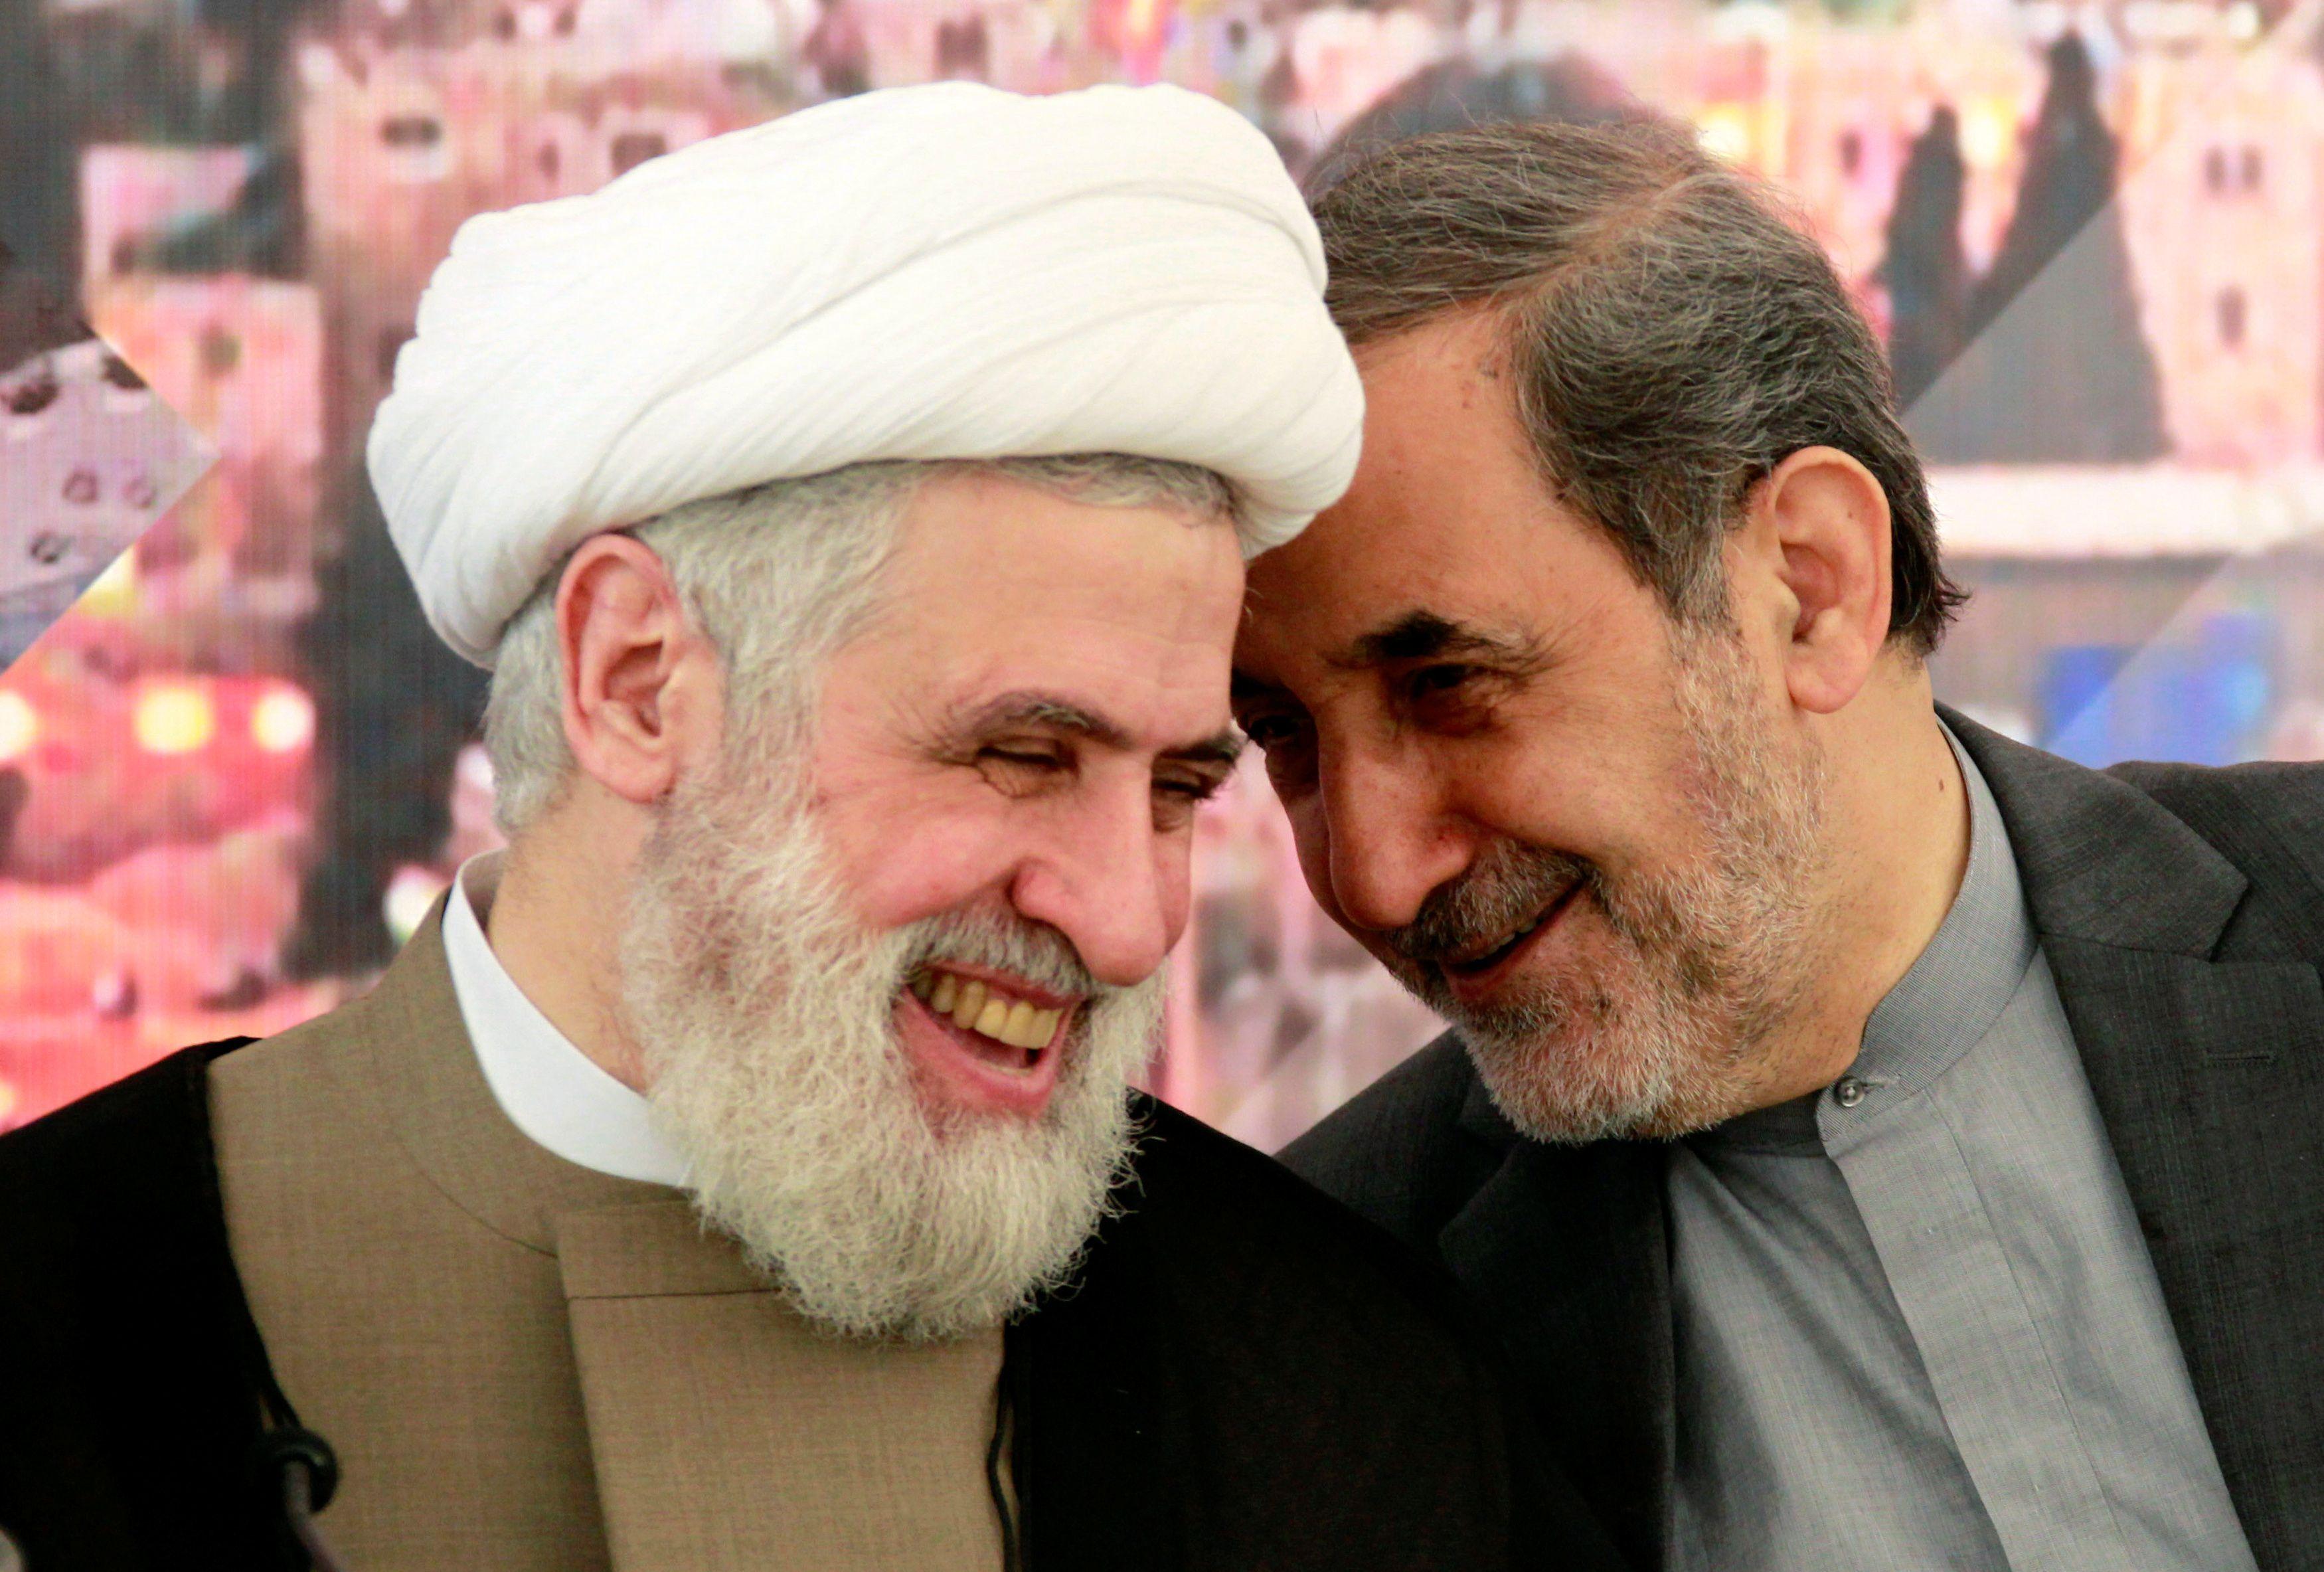 2016-05-05T120000Z_2033216091_S1BETCHAJEAA_RTRMADP_3_MIDEAST-CRISIS-LEBANON-IRAN